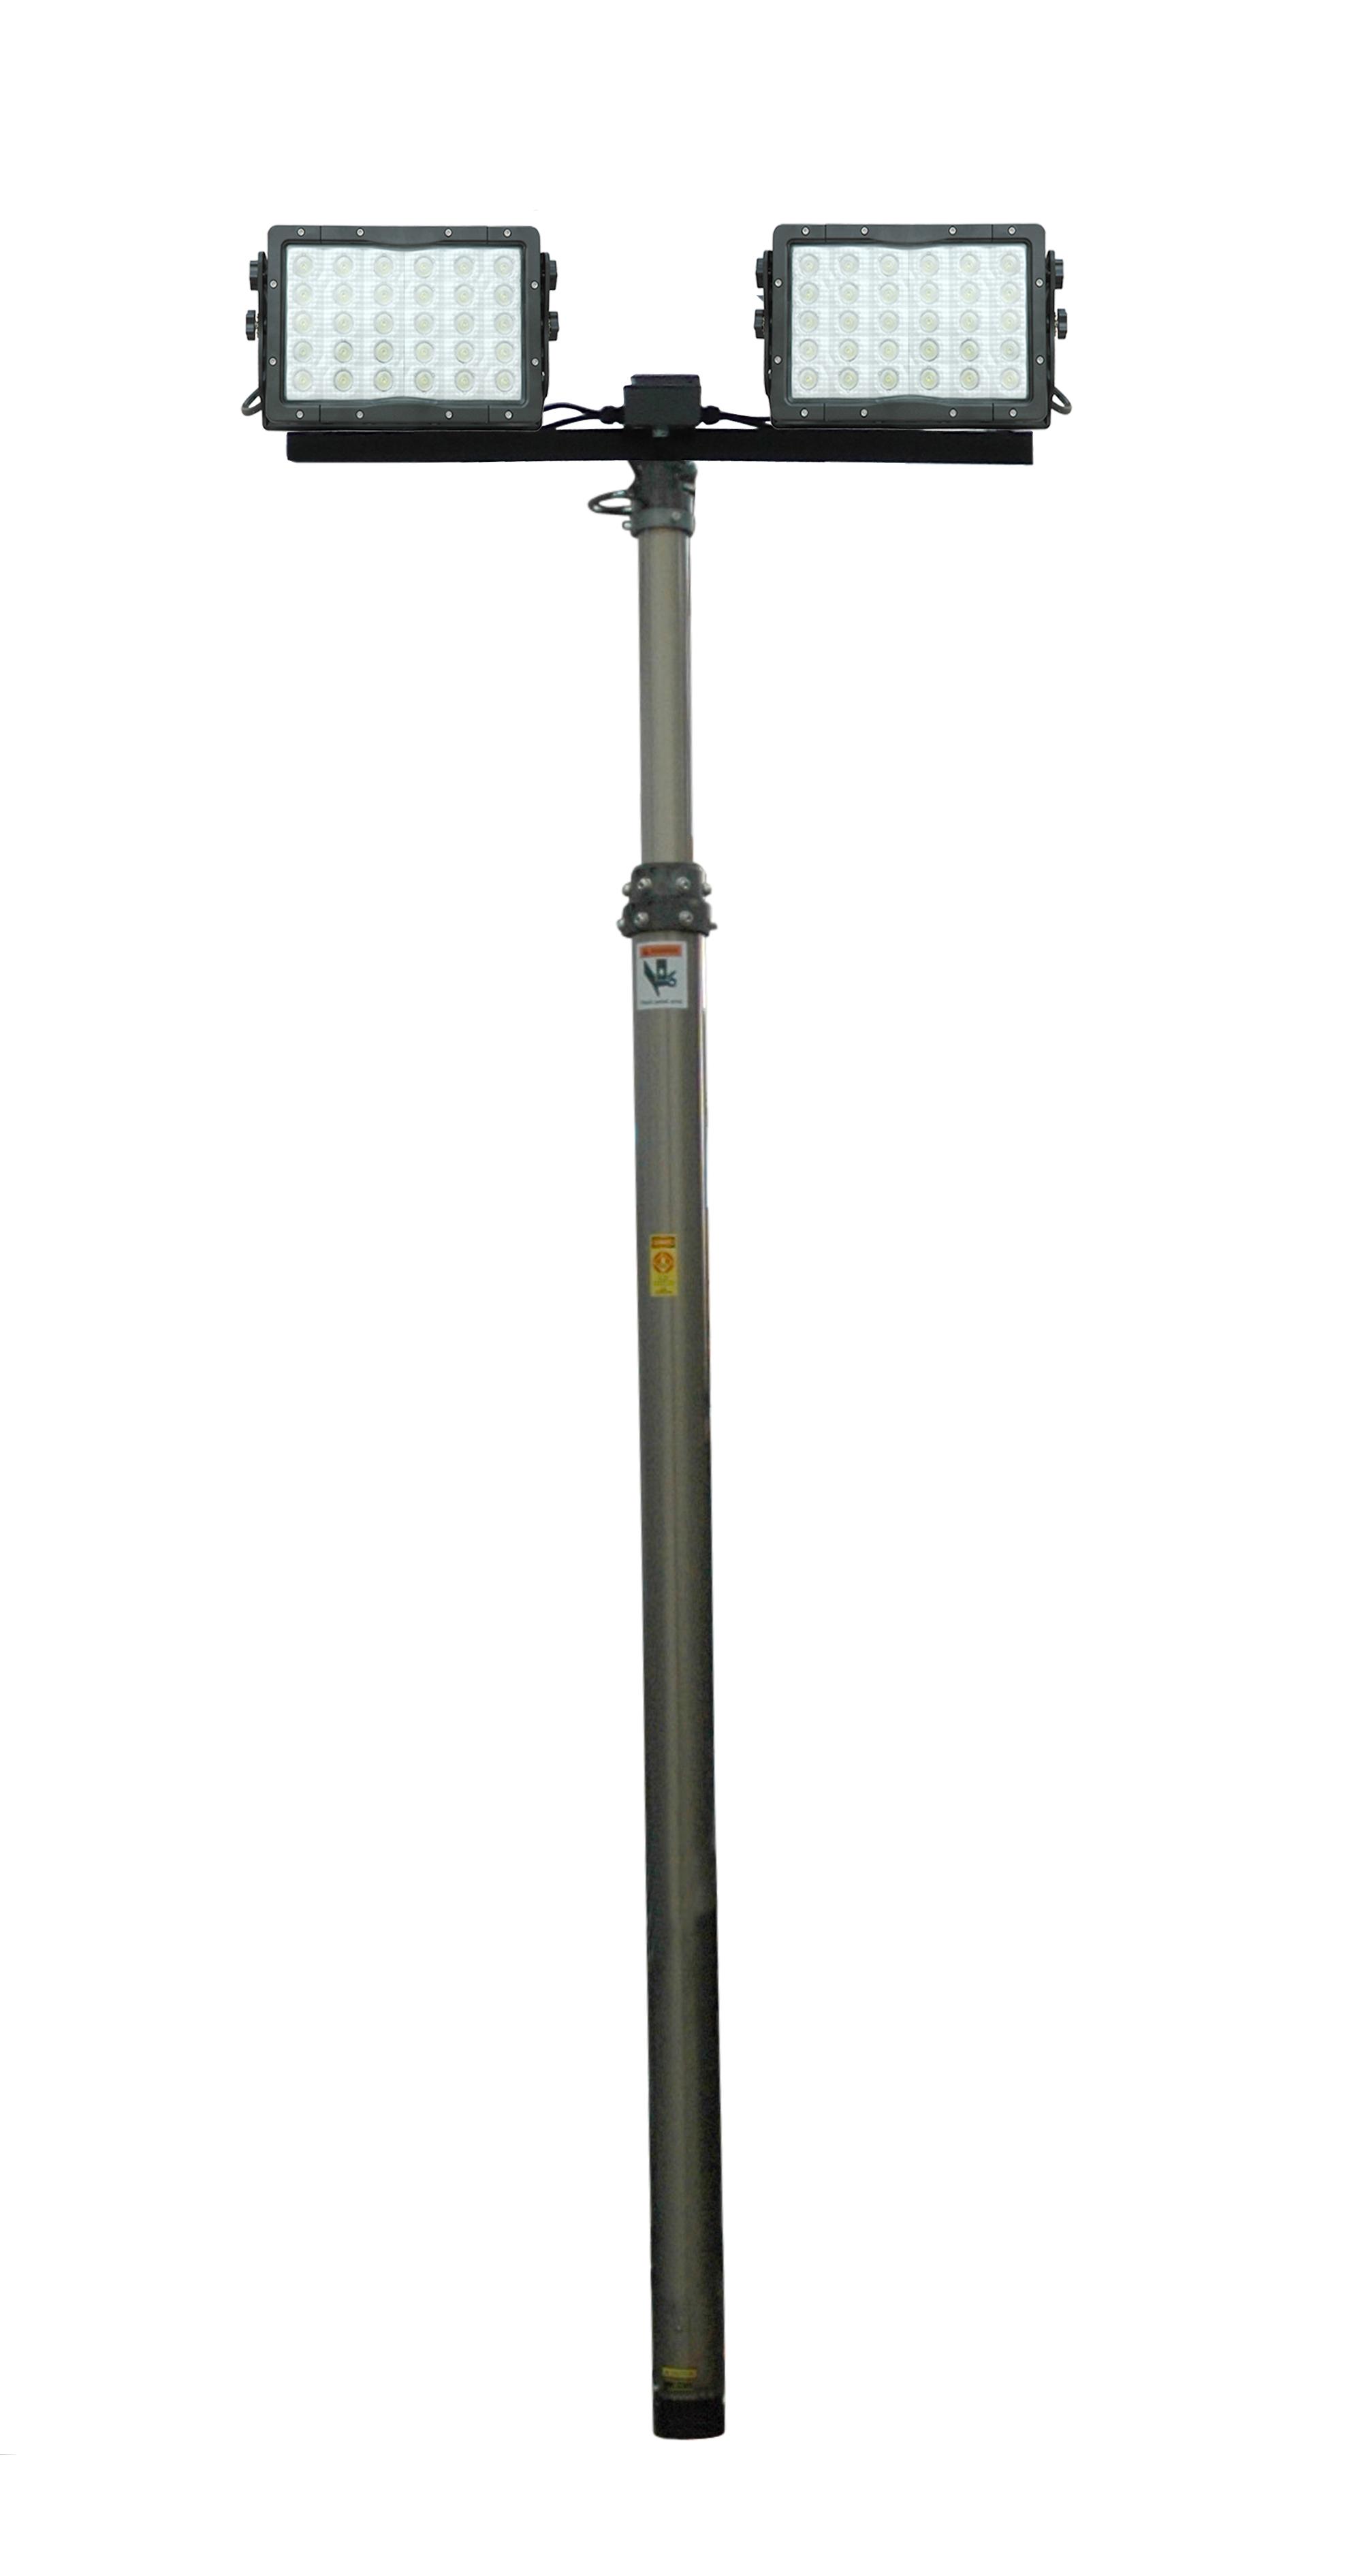 Larson Electronics Releases 300 Watt Pneumatic Light Tower